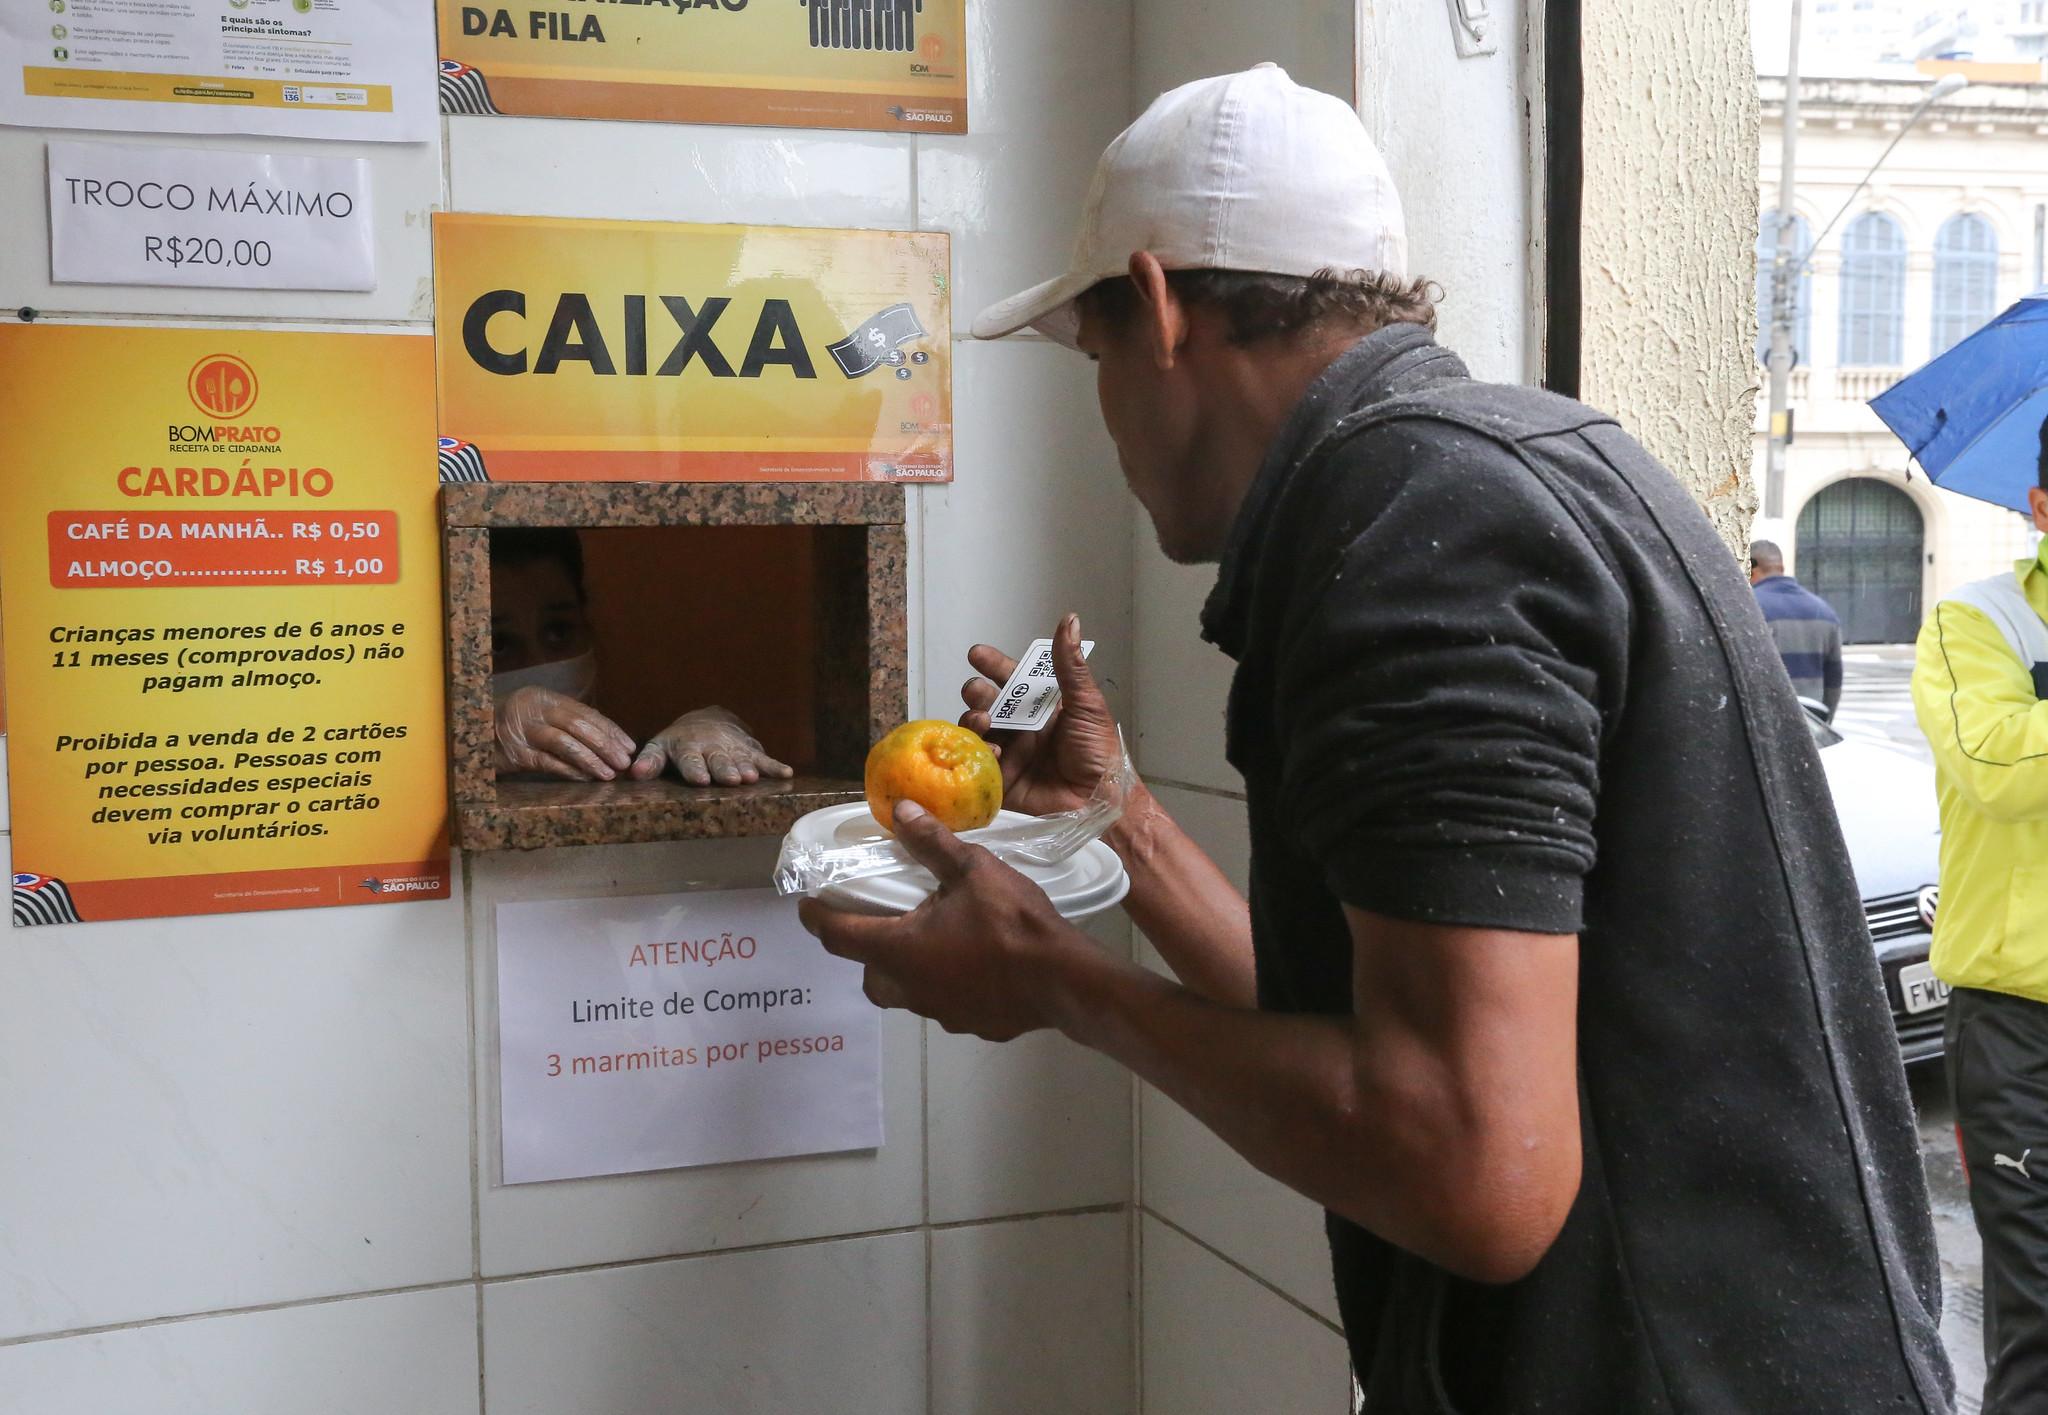 Bom Prato, São Paulo